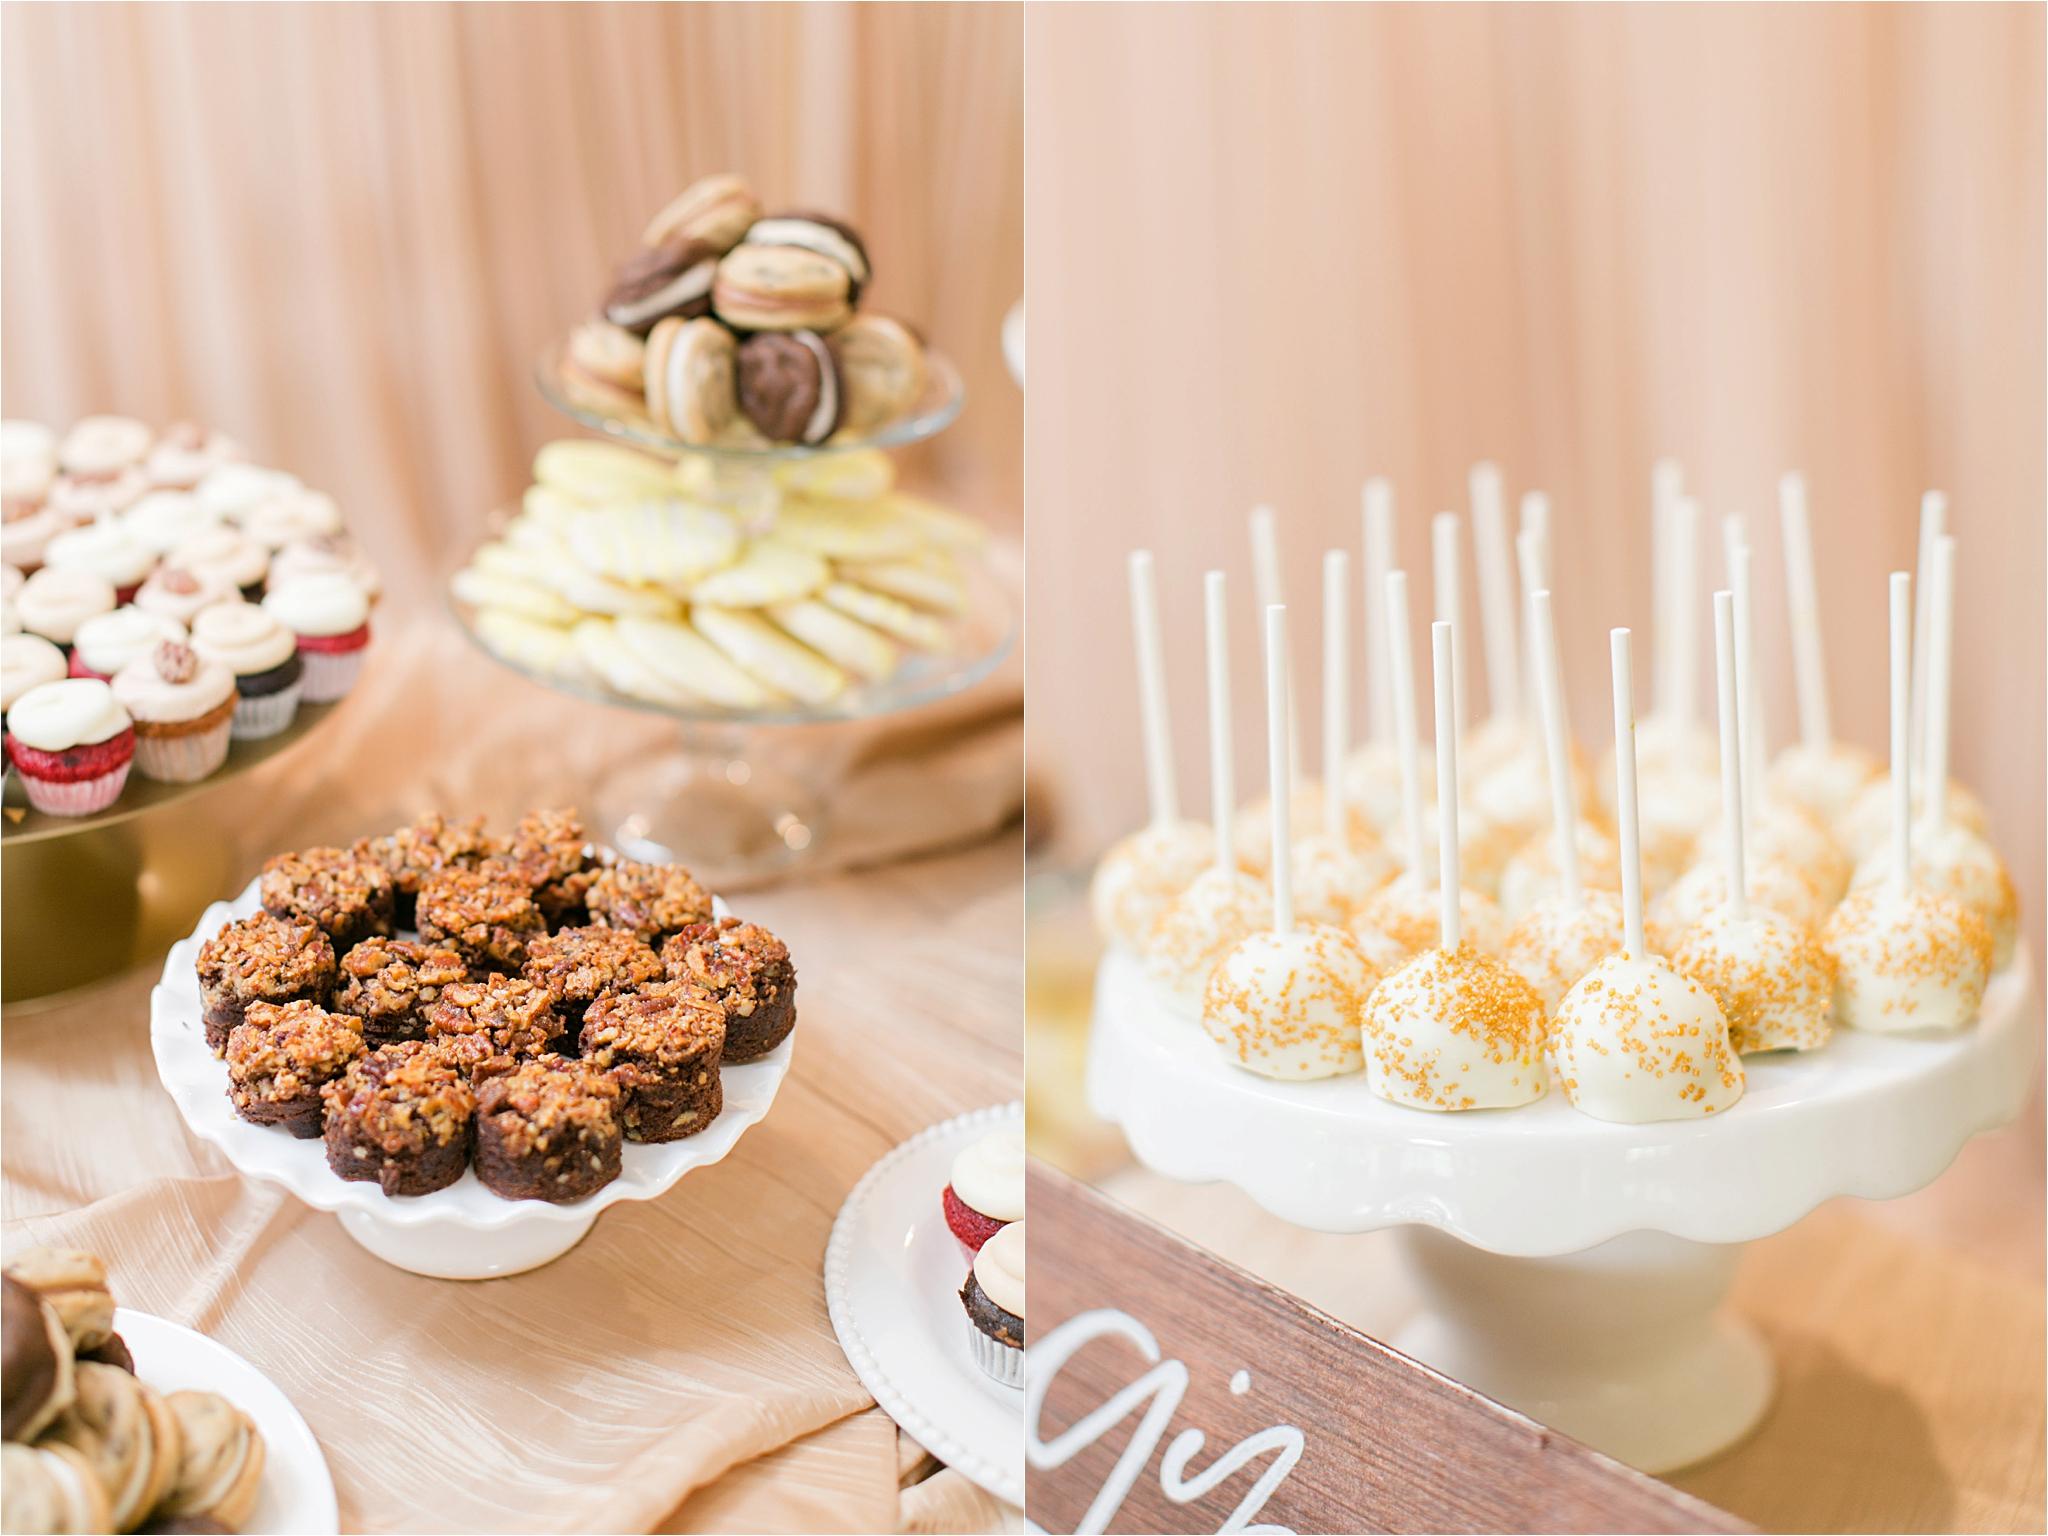 Ellenjay Desserts